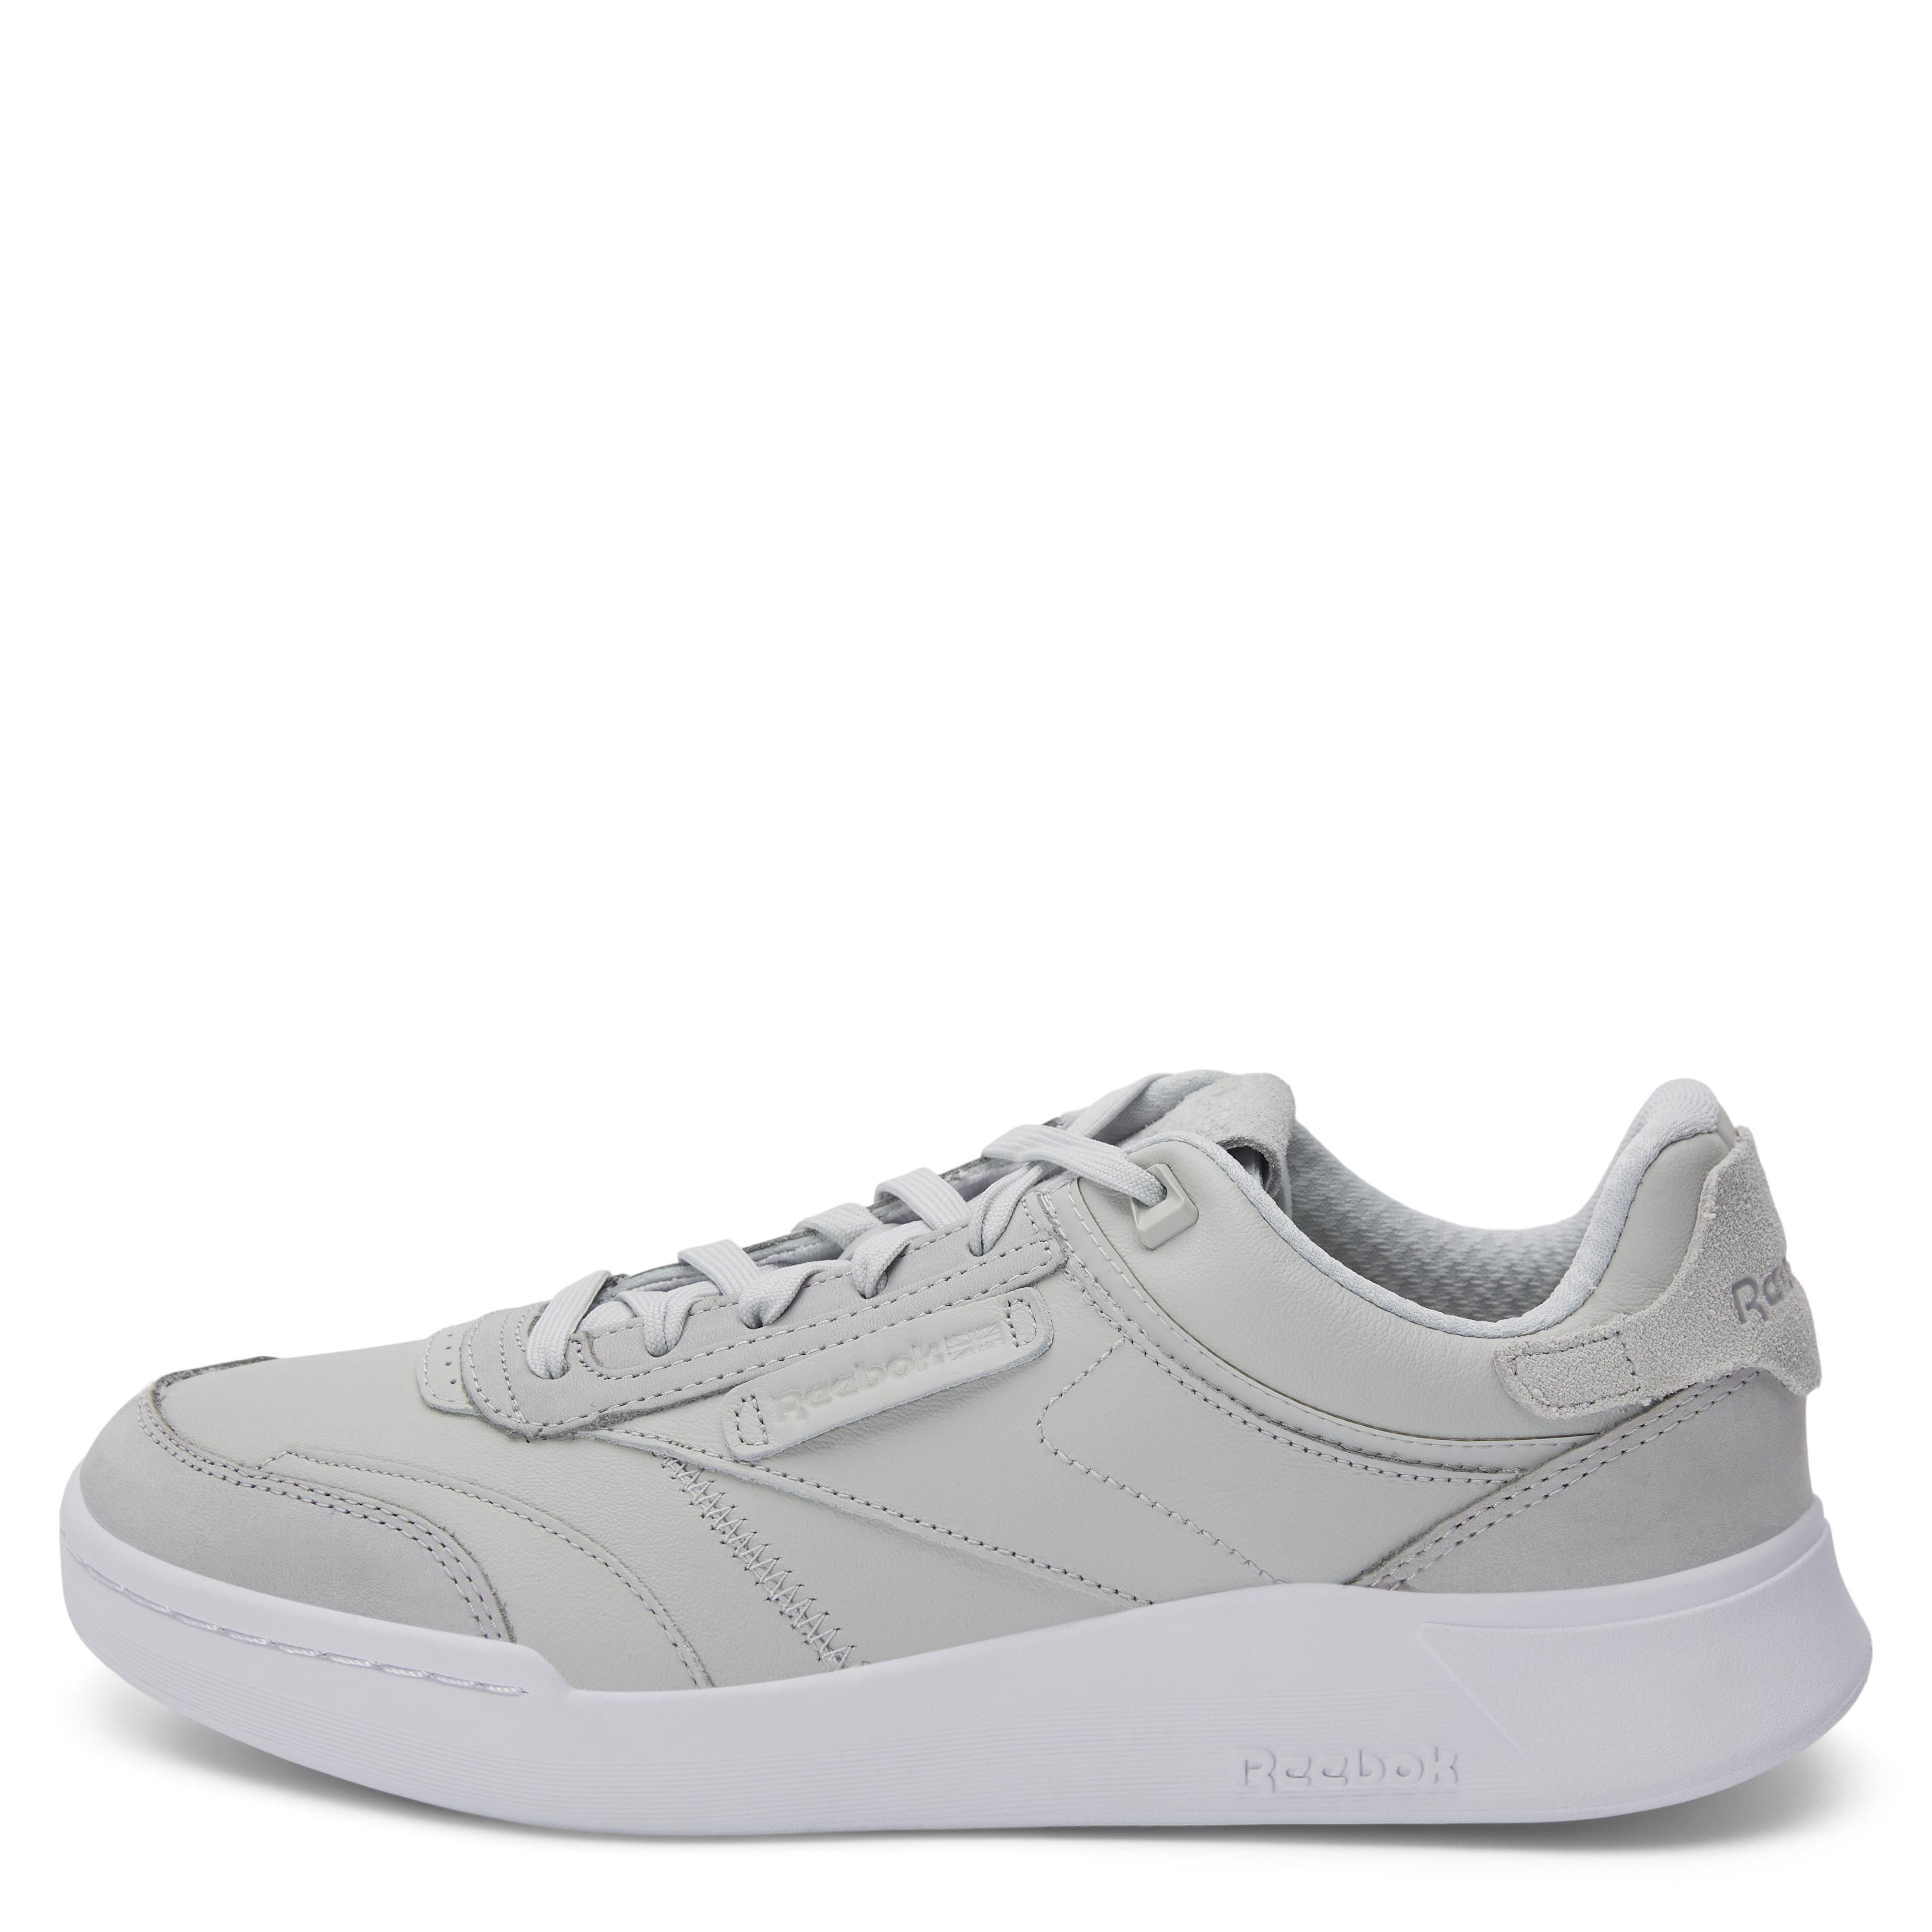 Club C Legacy Sneaker - Shoes - Grey